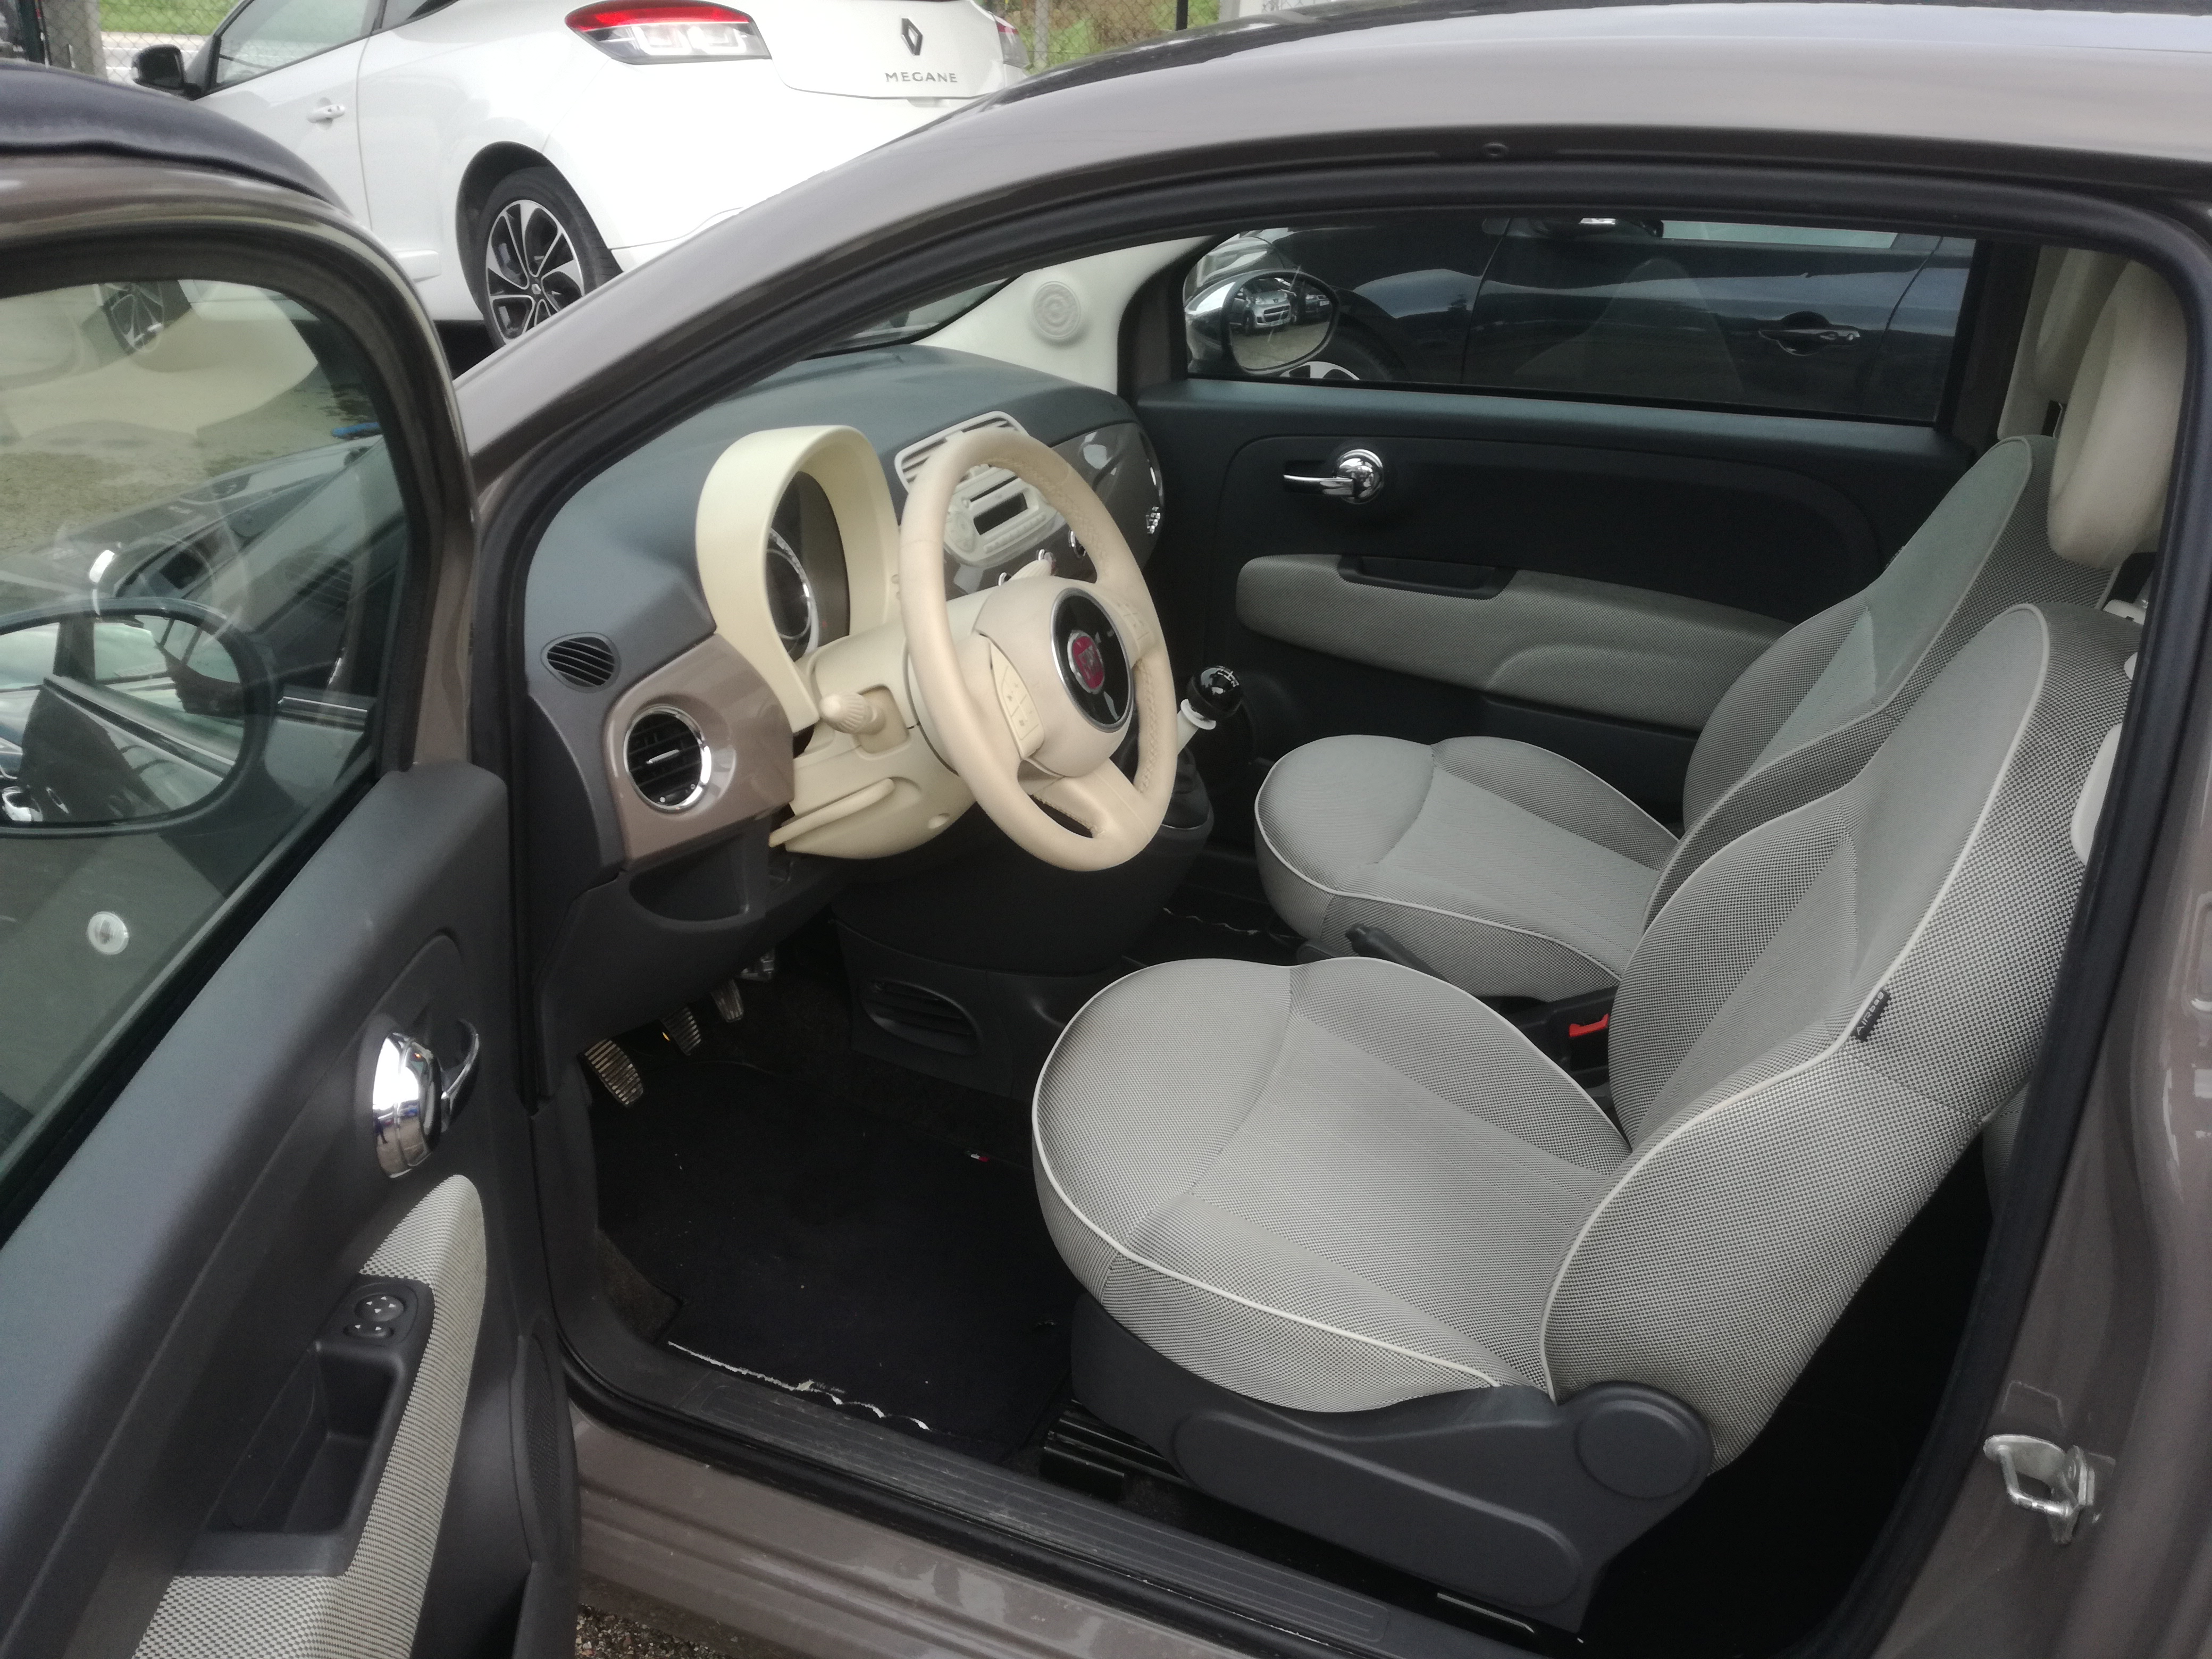 Fiat 500 1.3 MULTIJET | Imagem 6